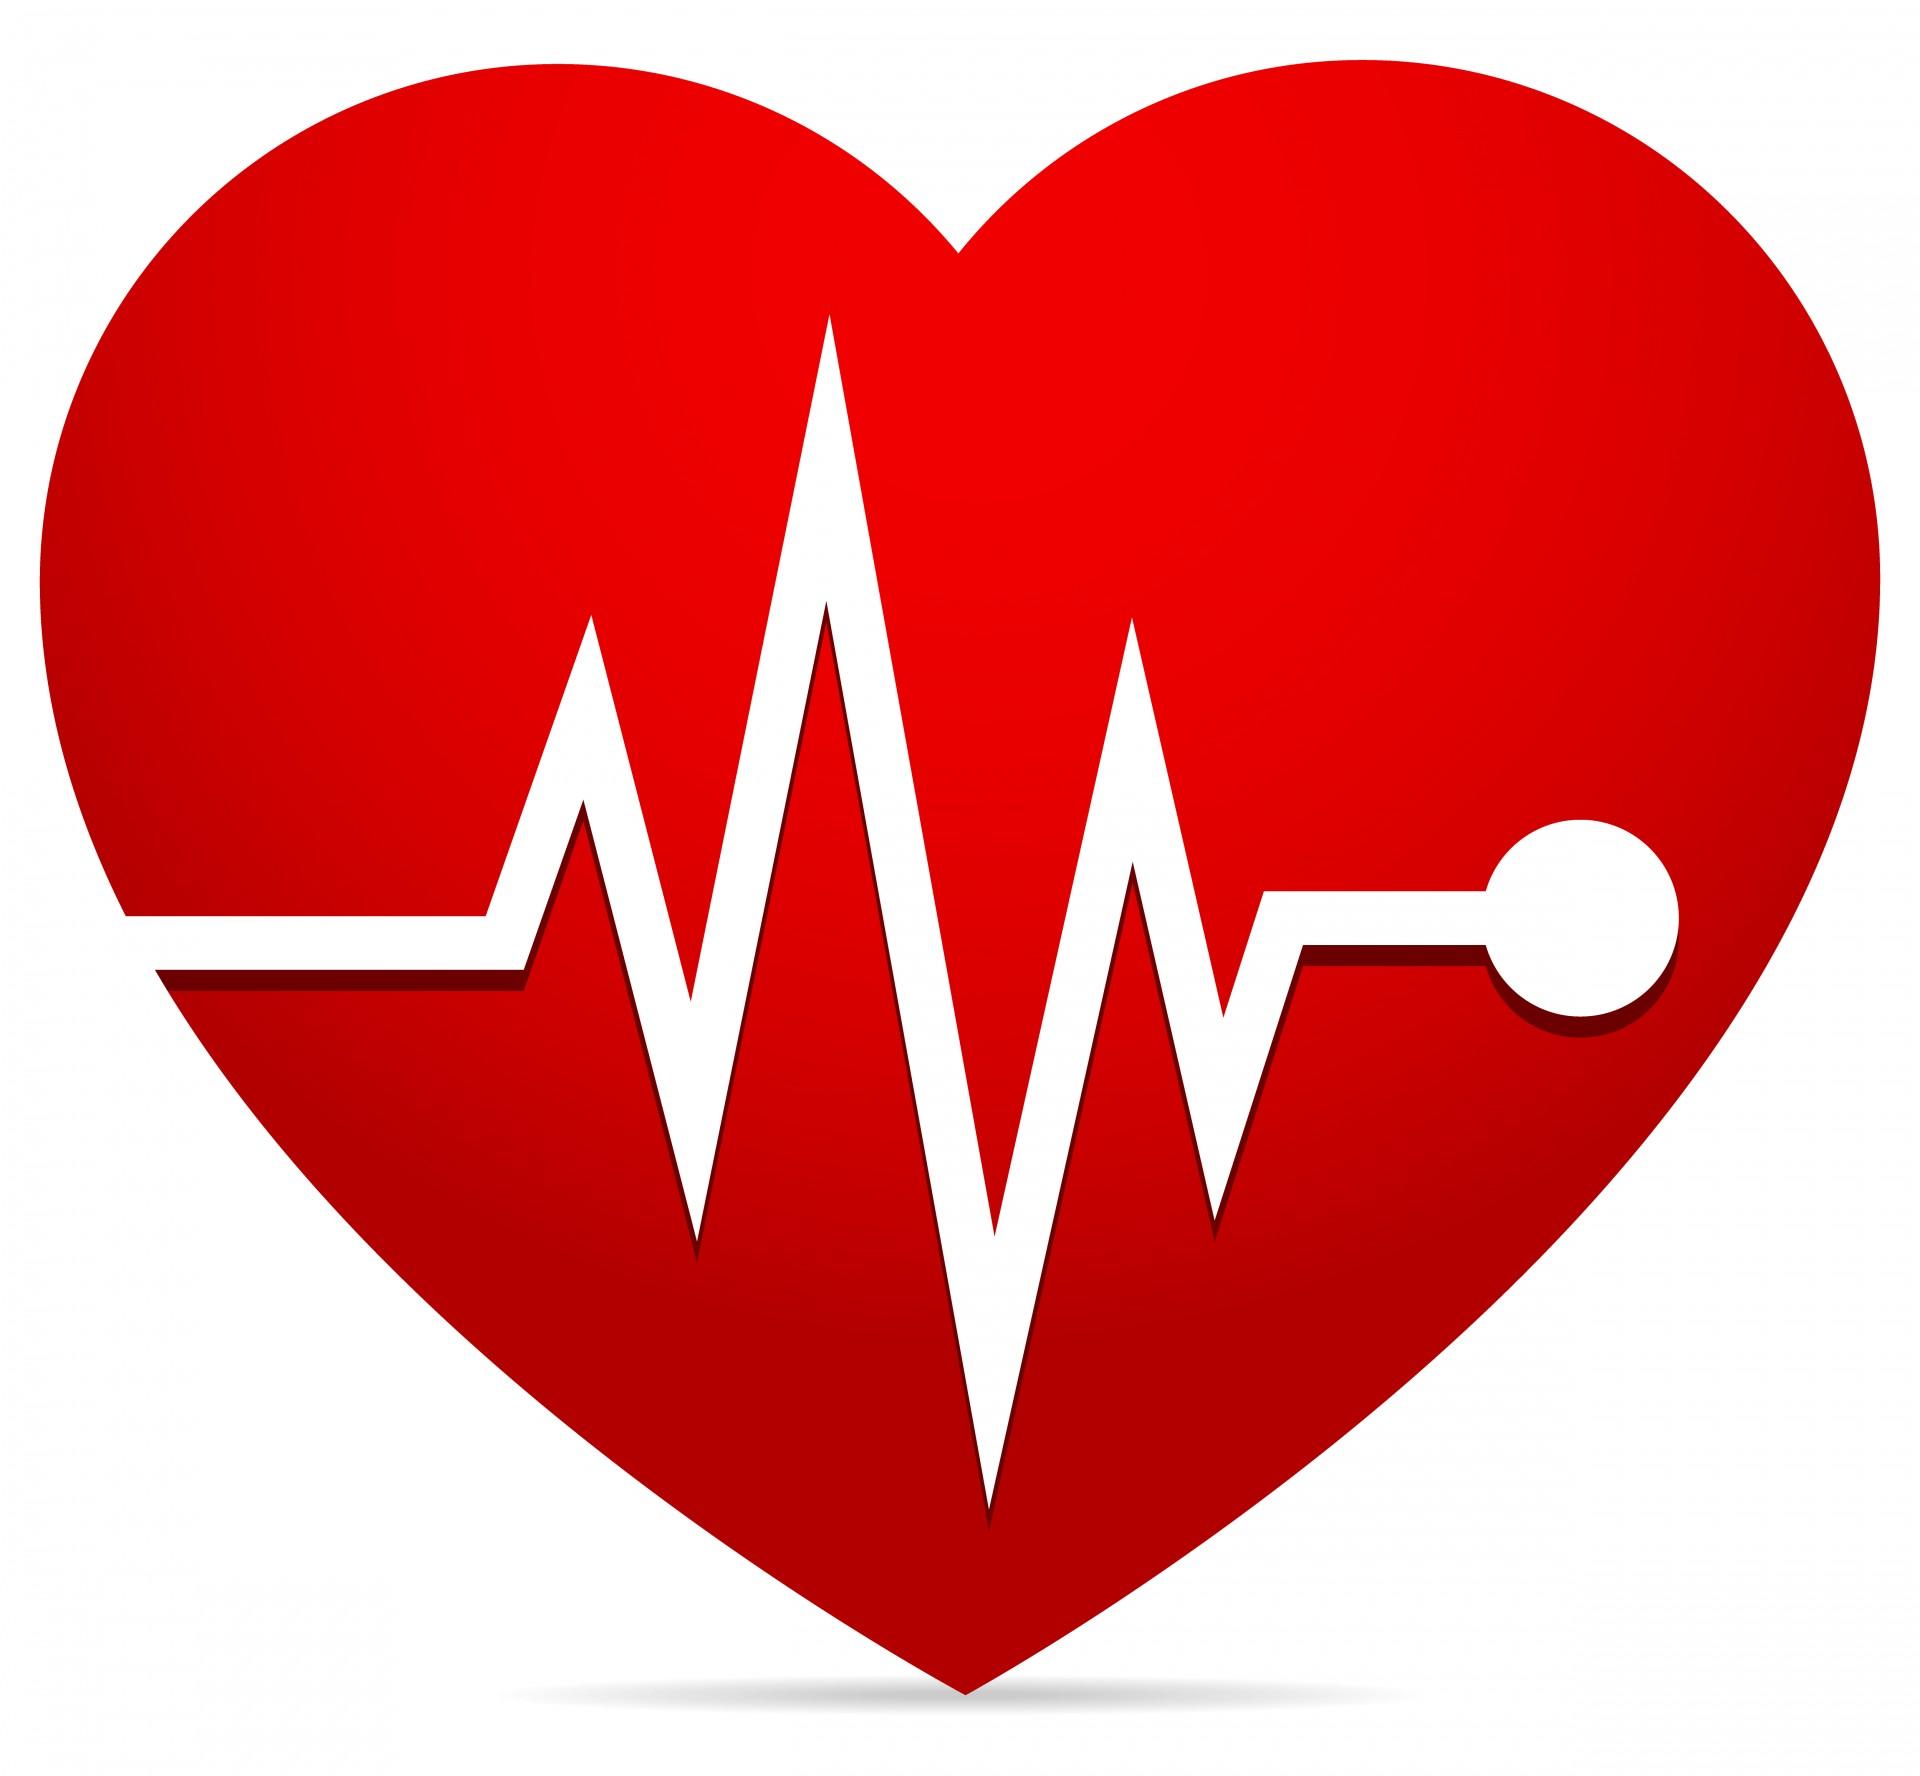 Heart Rate Ekg Ecg Heart Beat Free Stock Photo Hd Public Domain